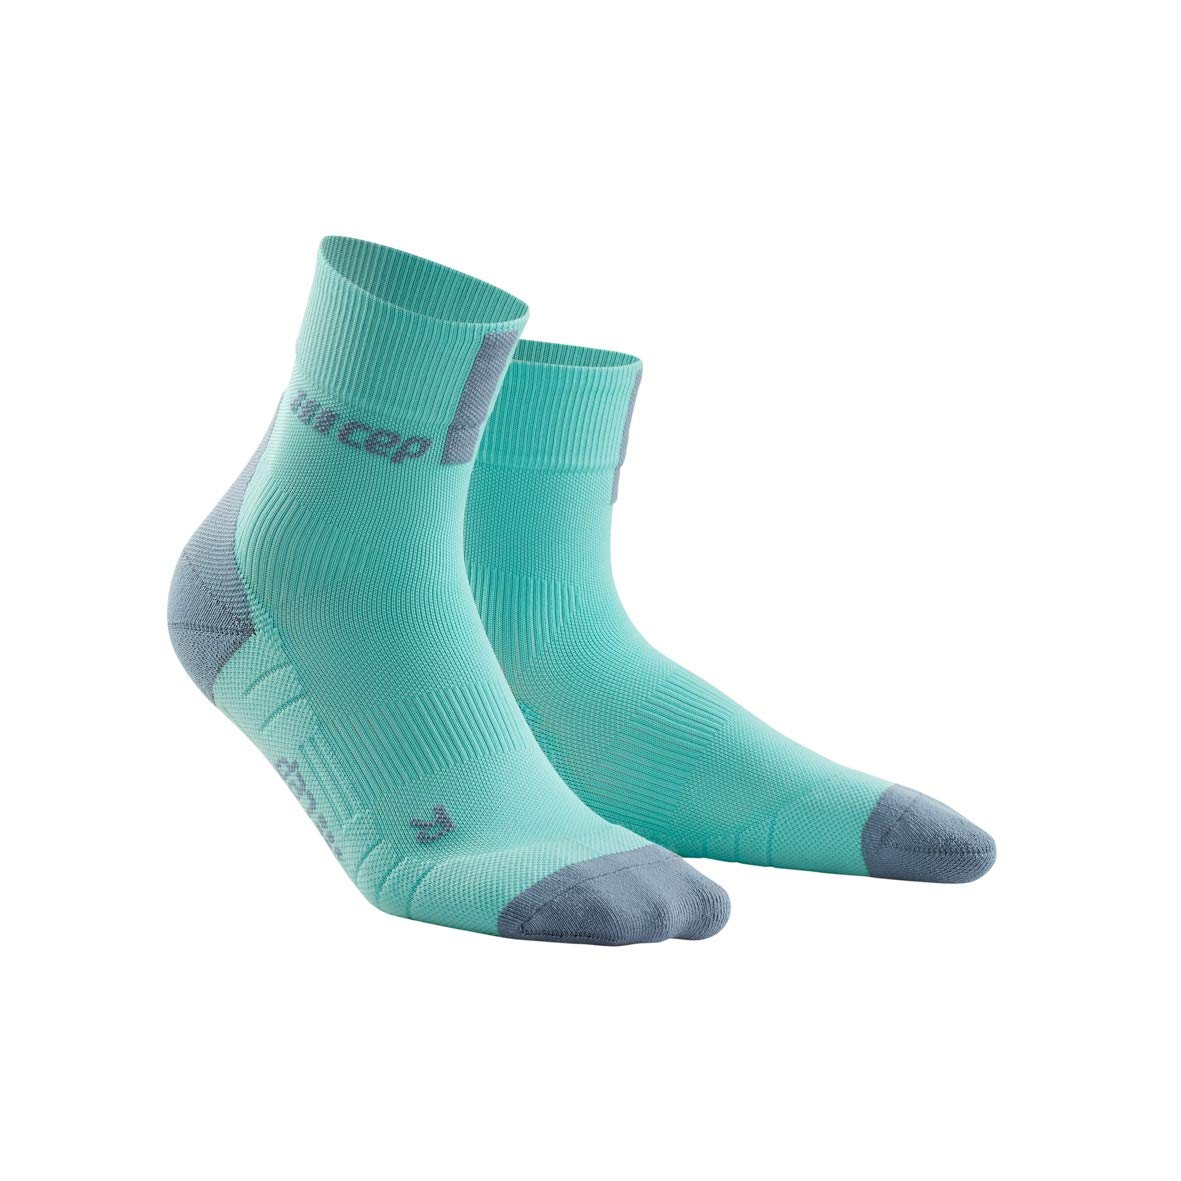 CEP Men's Short Crew 3.0 Compression Running Socks